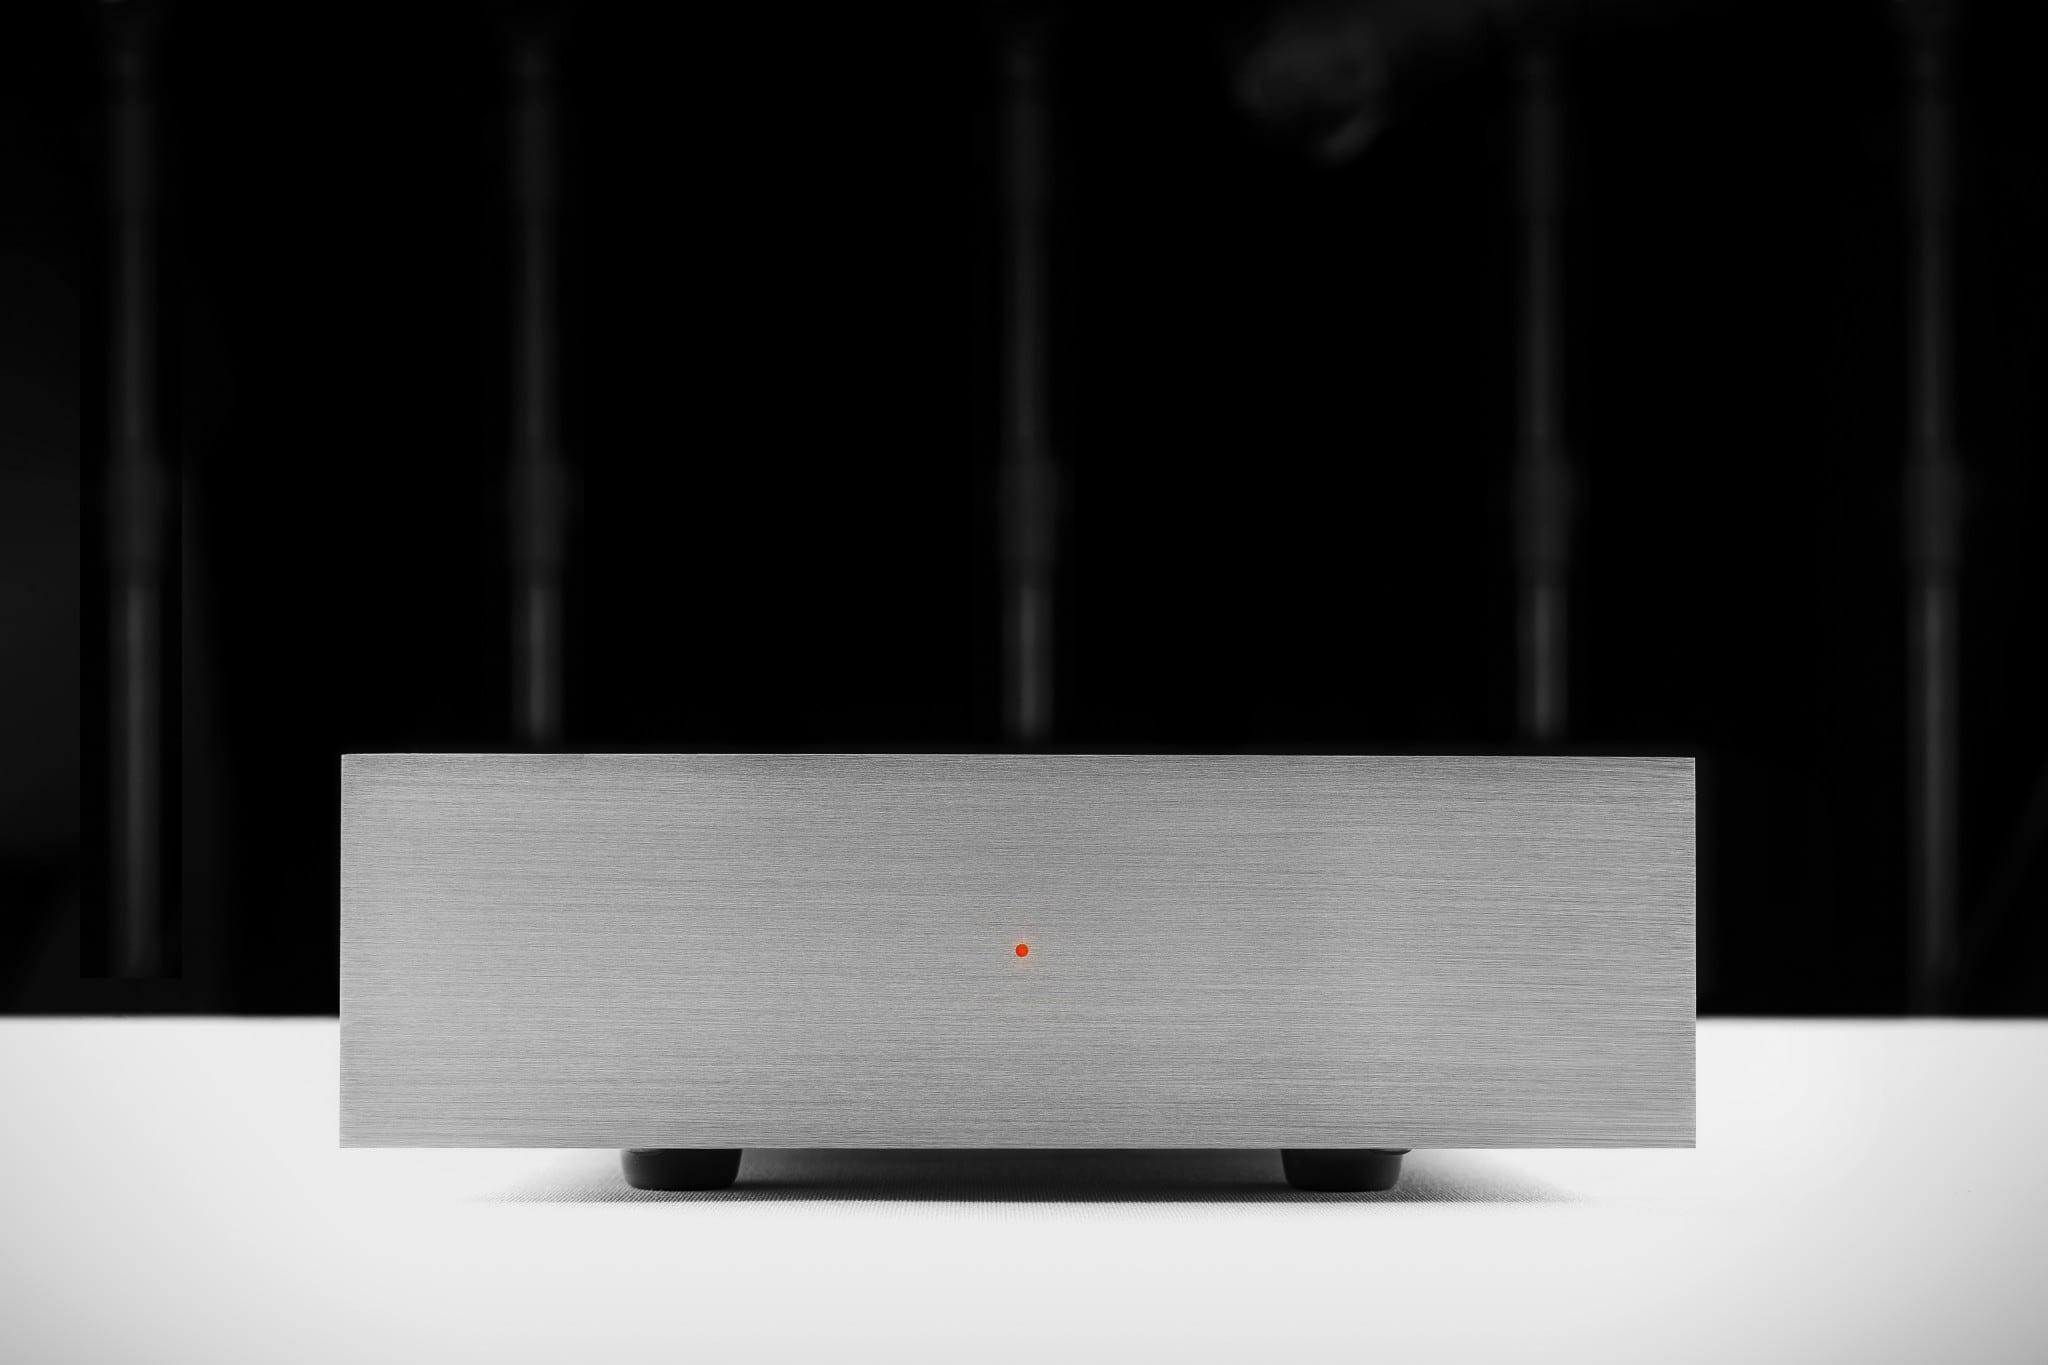 Densen Cast Amp (Amplificador y Streamer) DENSEN-CAST_AMP_014